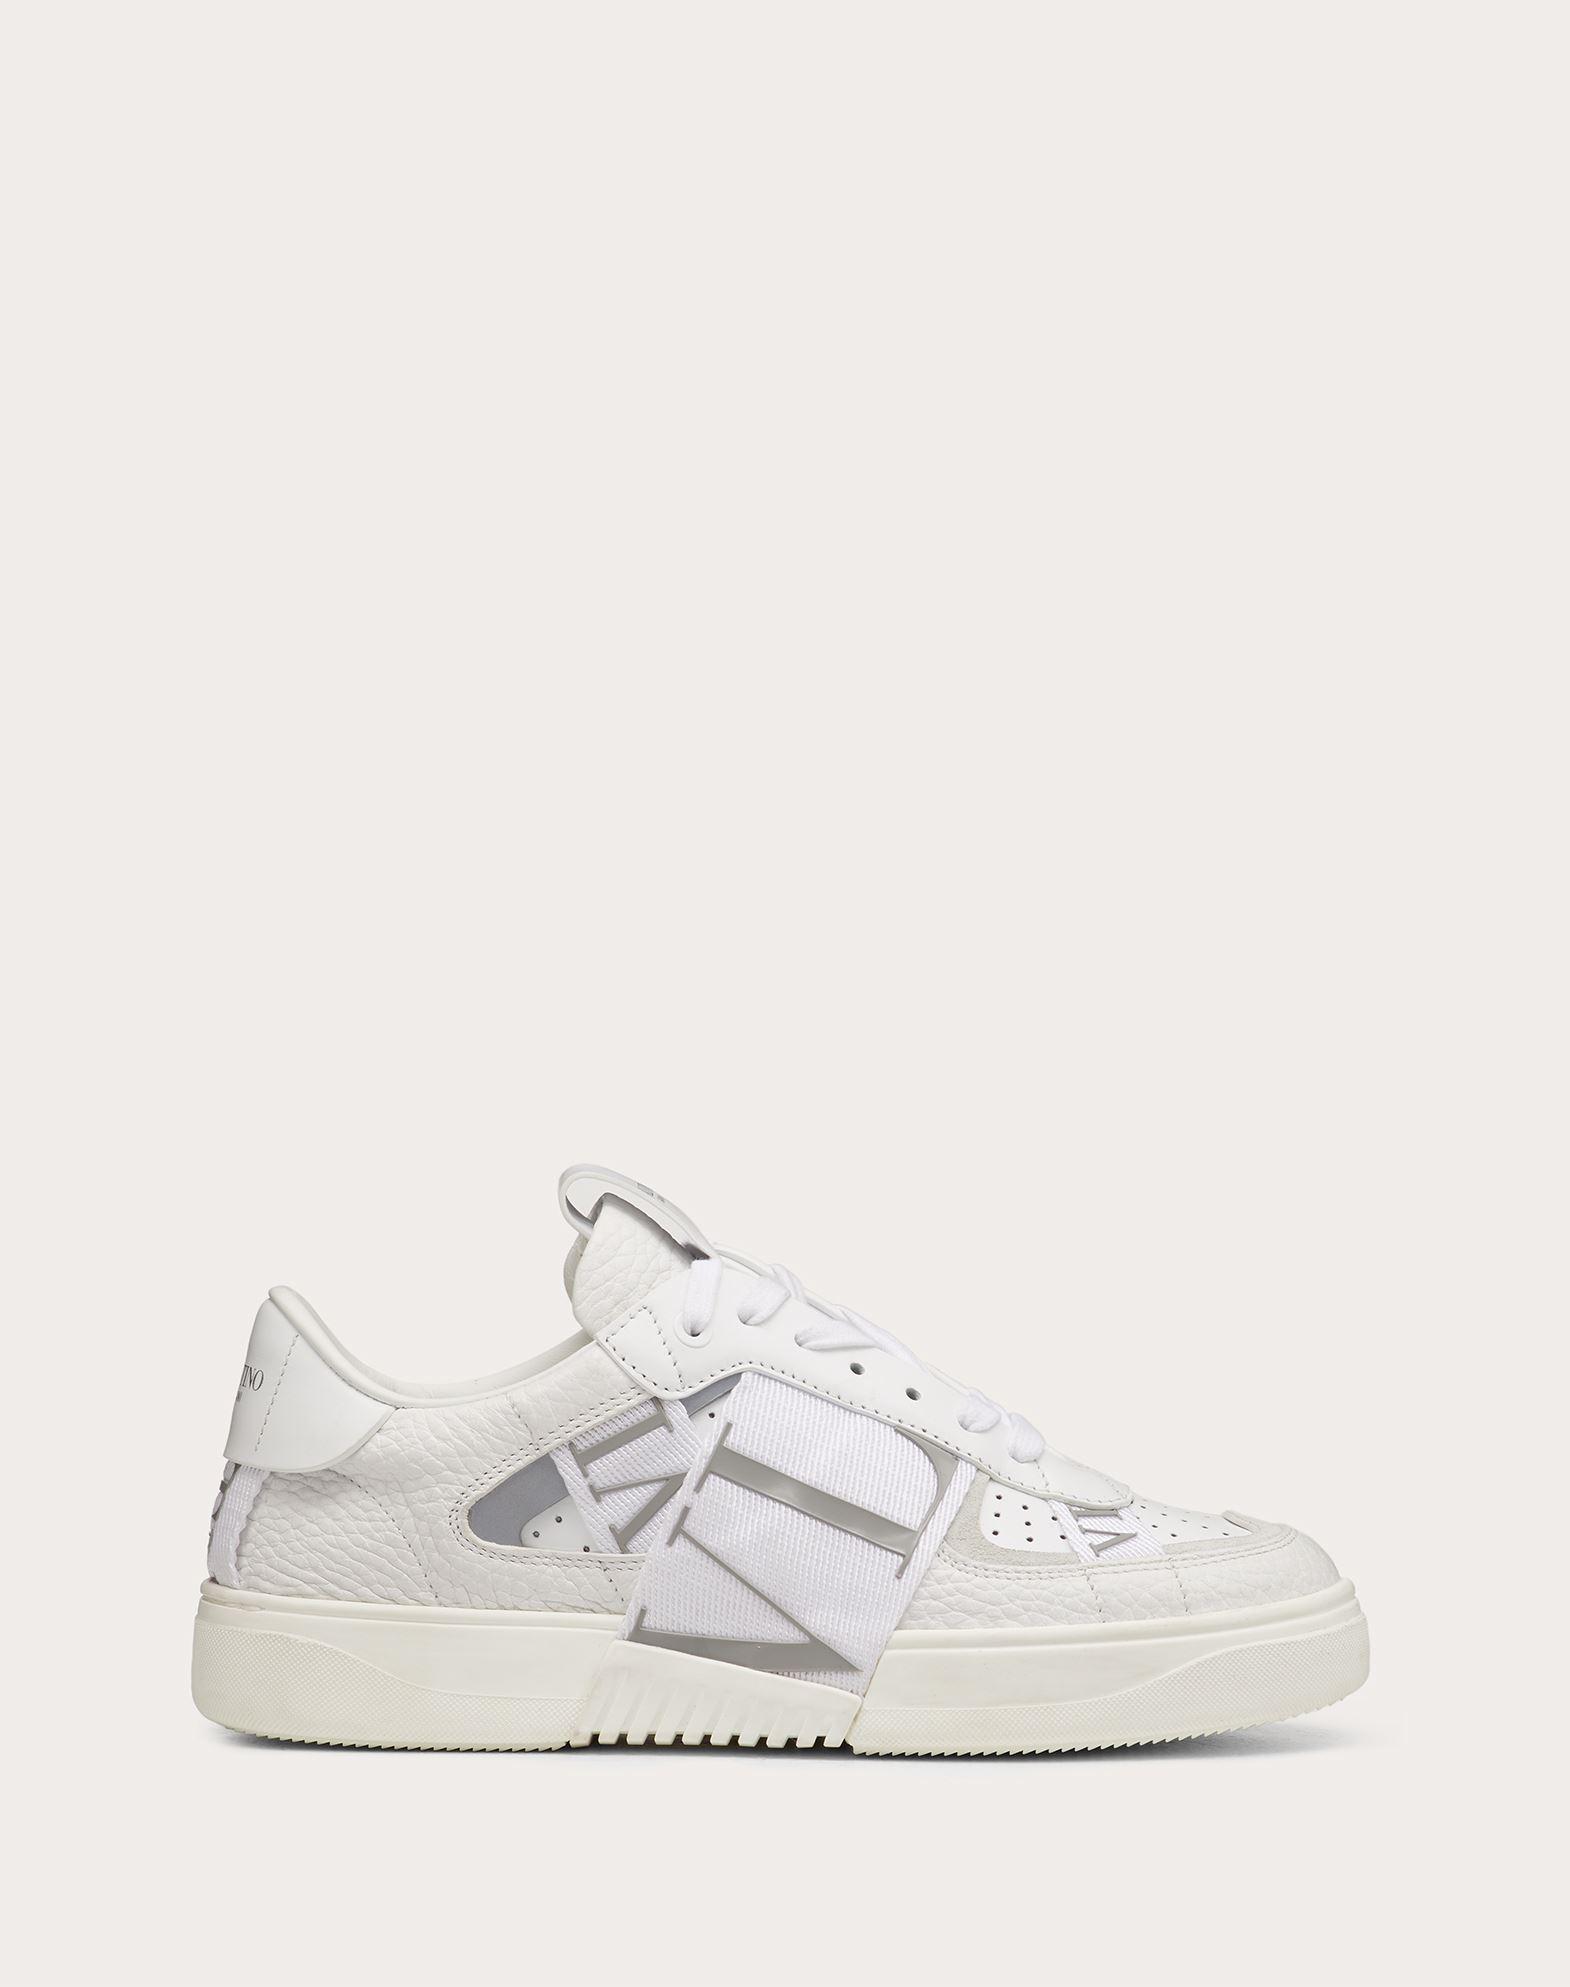 VL7N Sneaker in Banded Calfskin Leather